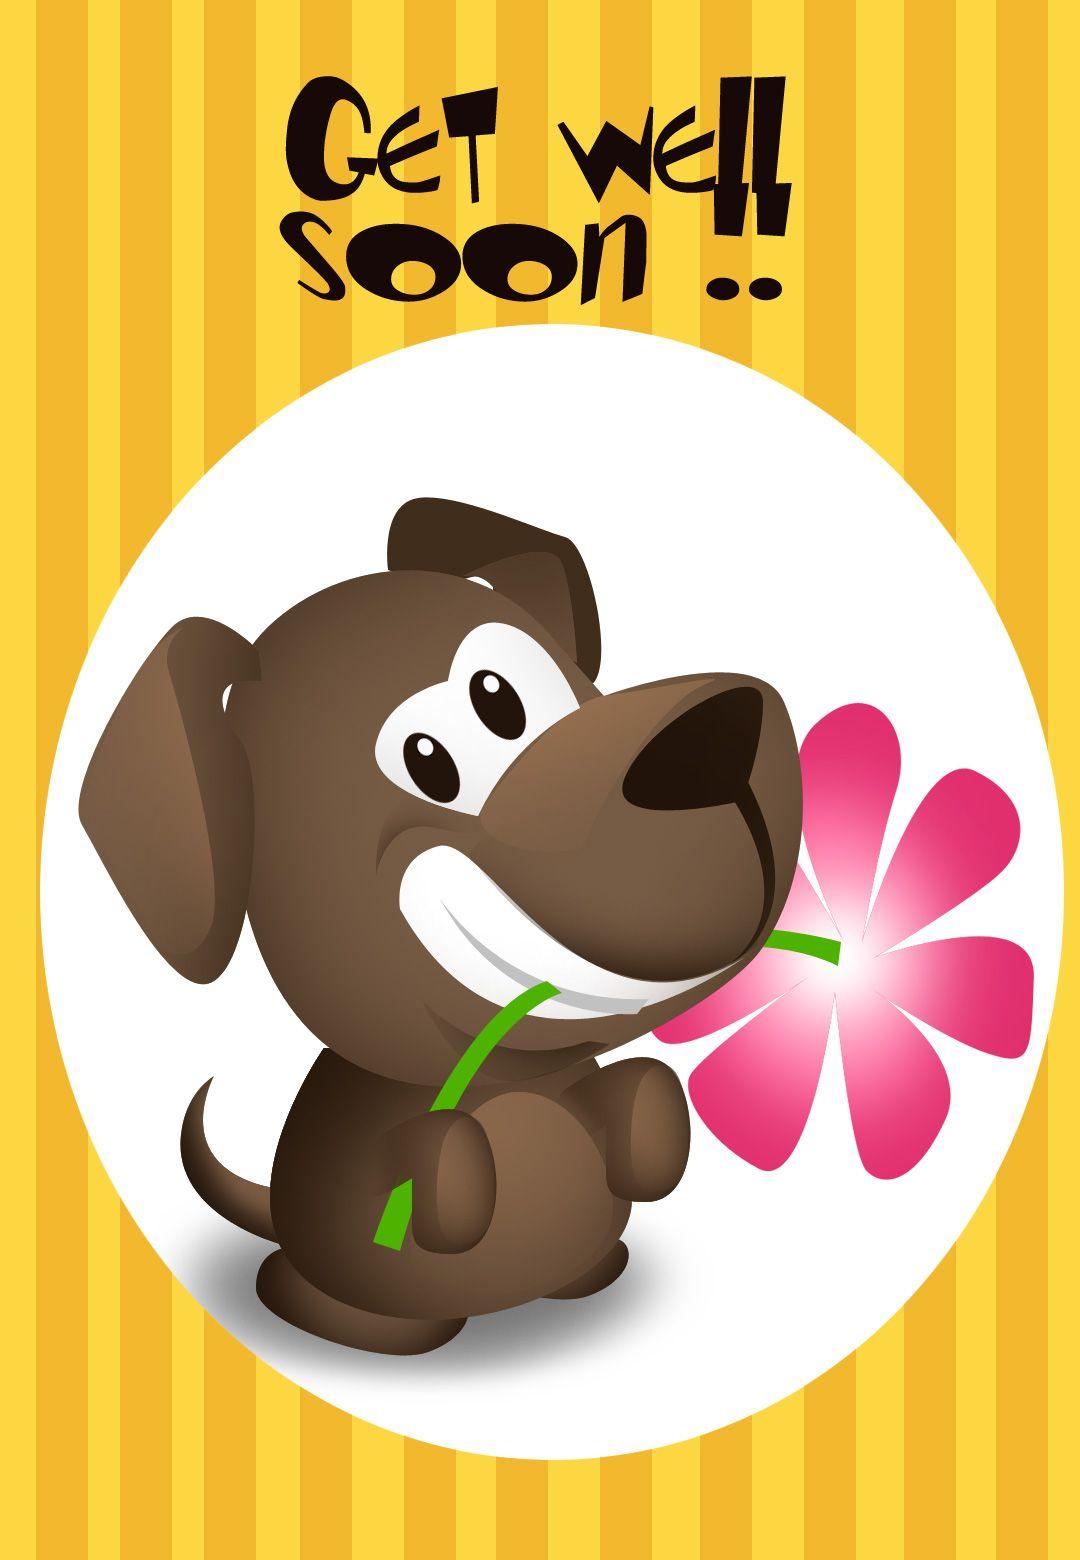 Get Well Soon Free Printable Get Well Soon Puppy Greeting Card - Free Printable Get Well Soon Cards